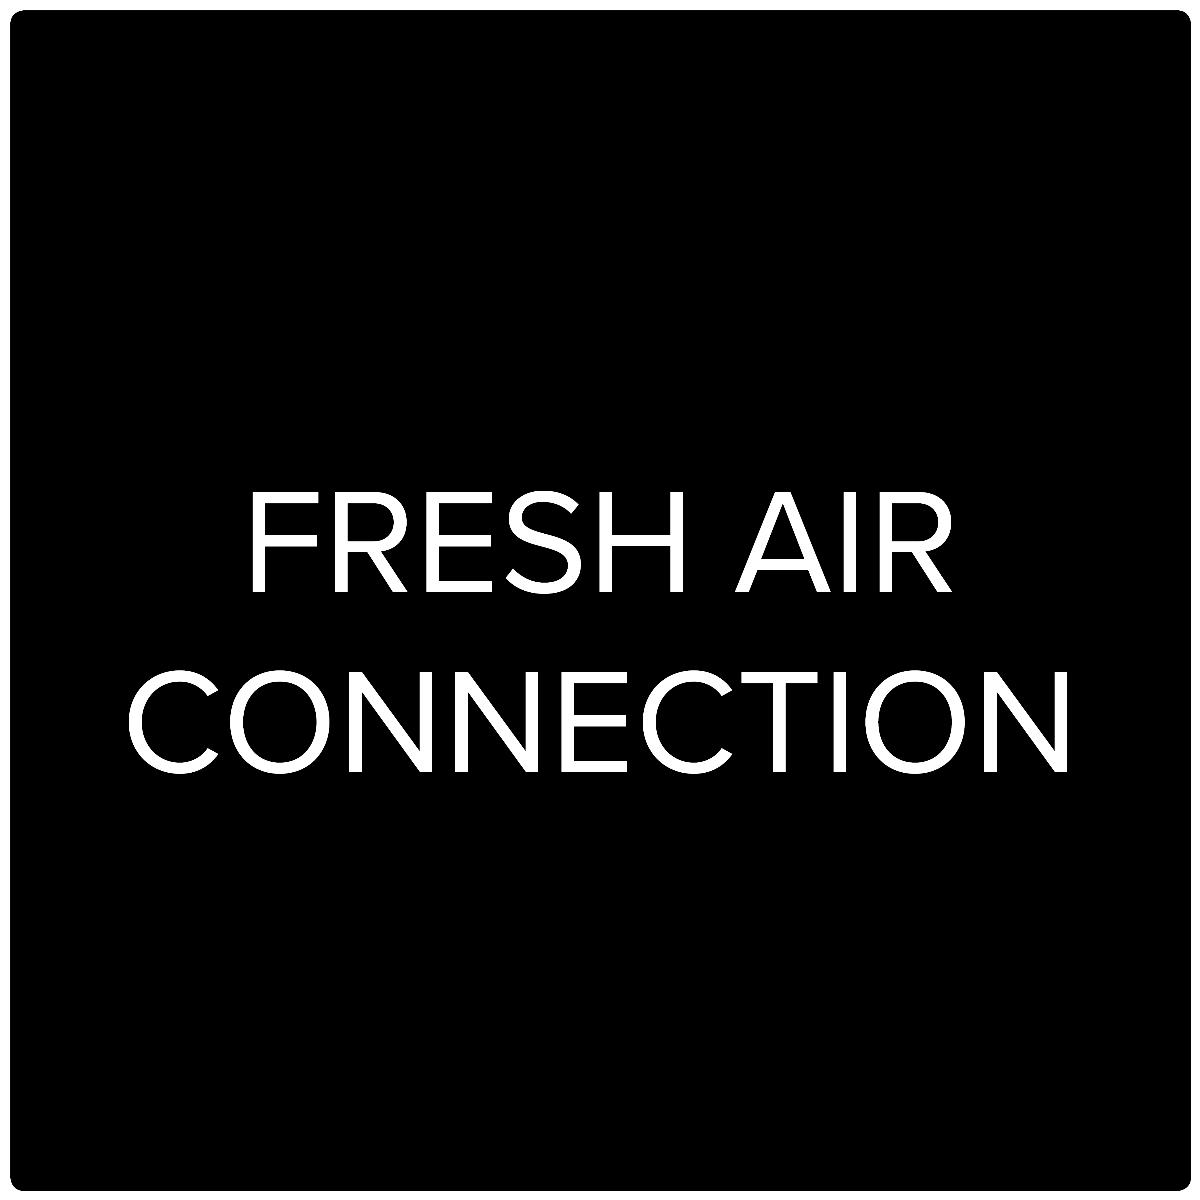 HWAM Video: Fresh air connection